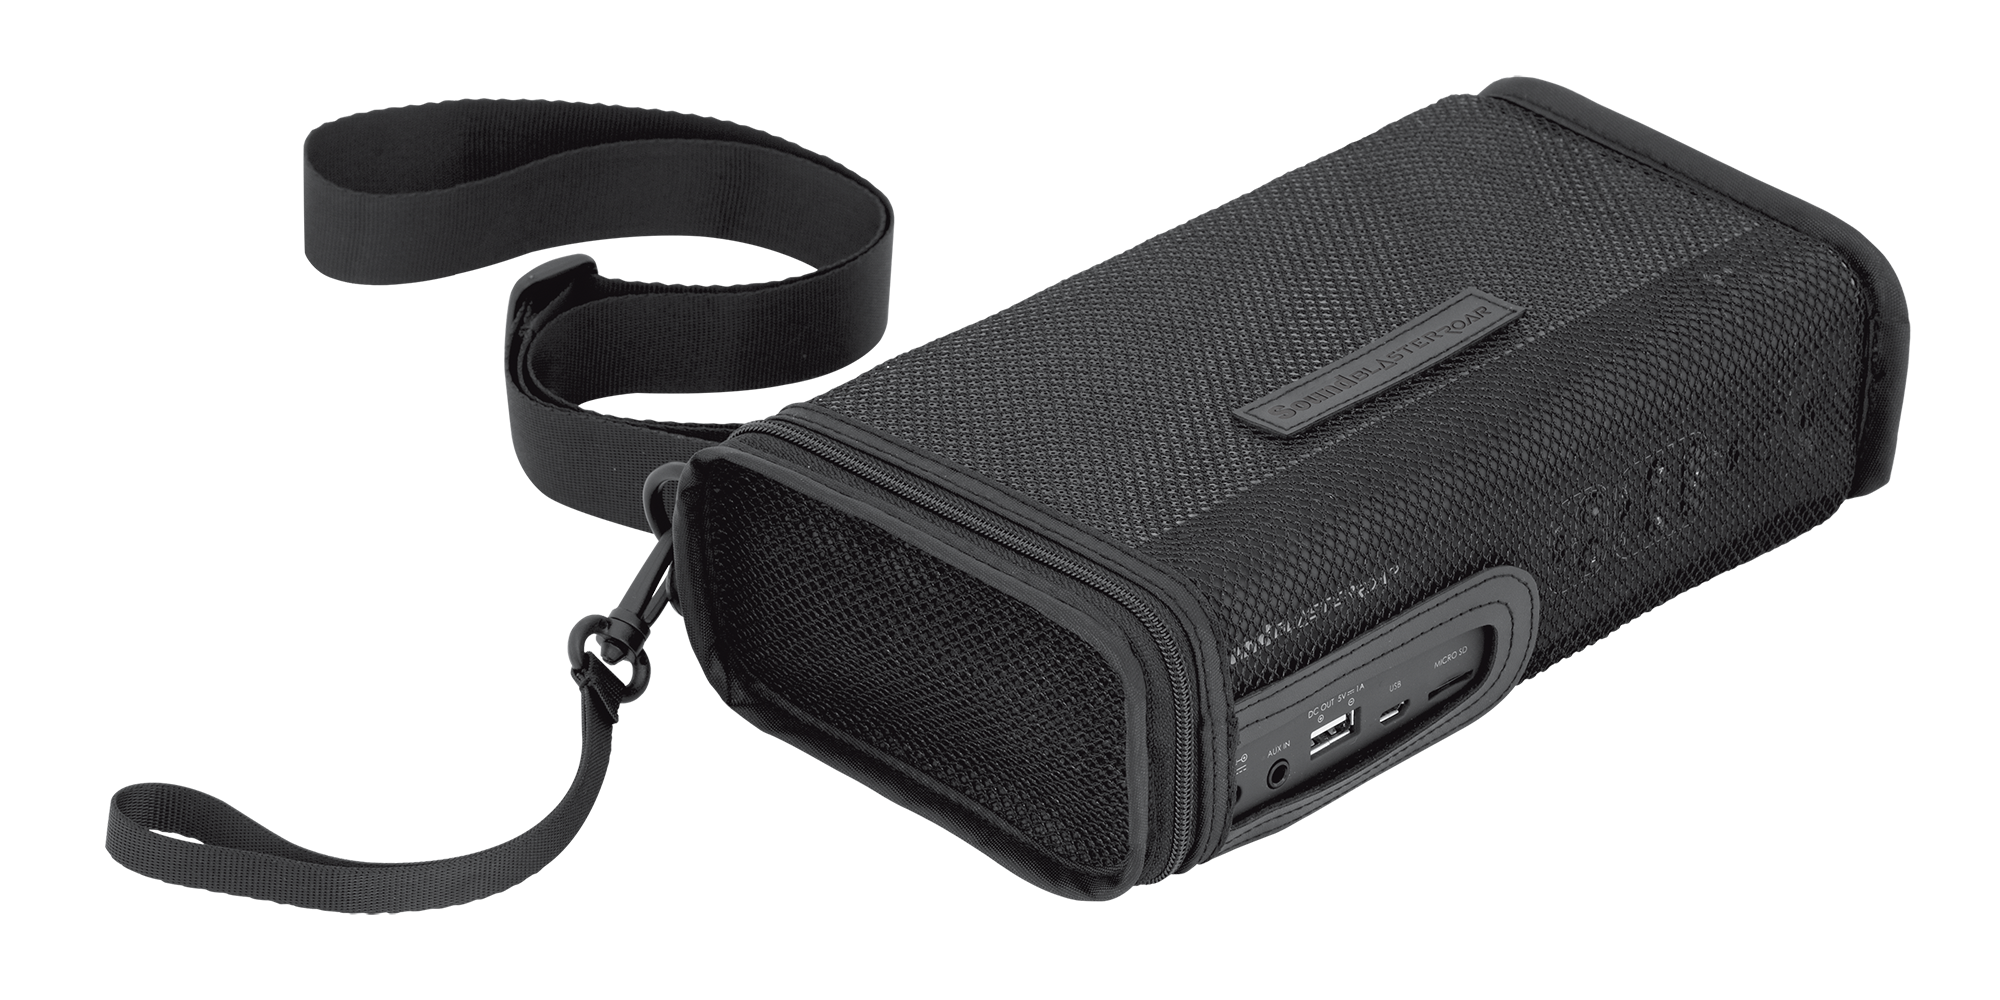 Myshop Lowepro Adventura Sh 120 Ii Black Sound Blaster Roar Carry Bag